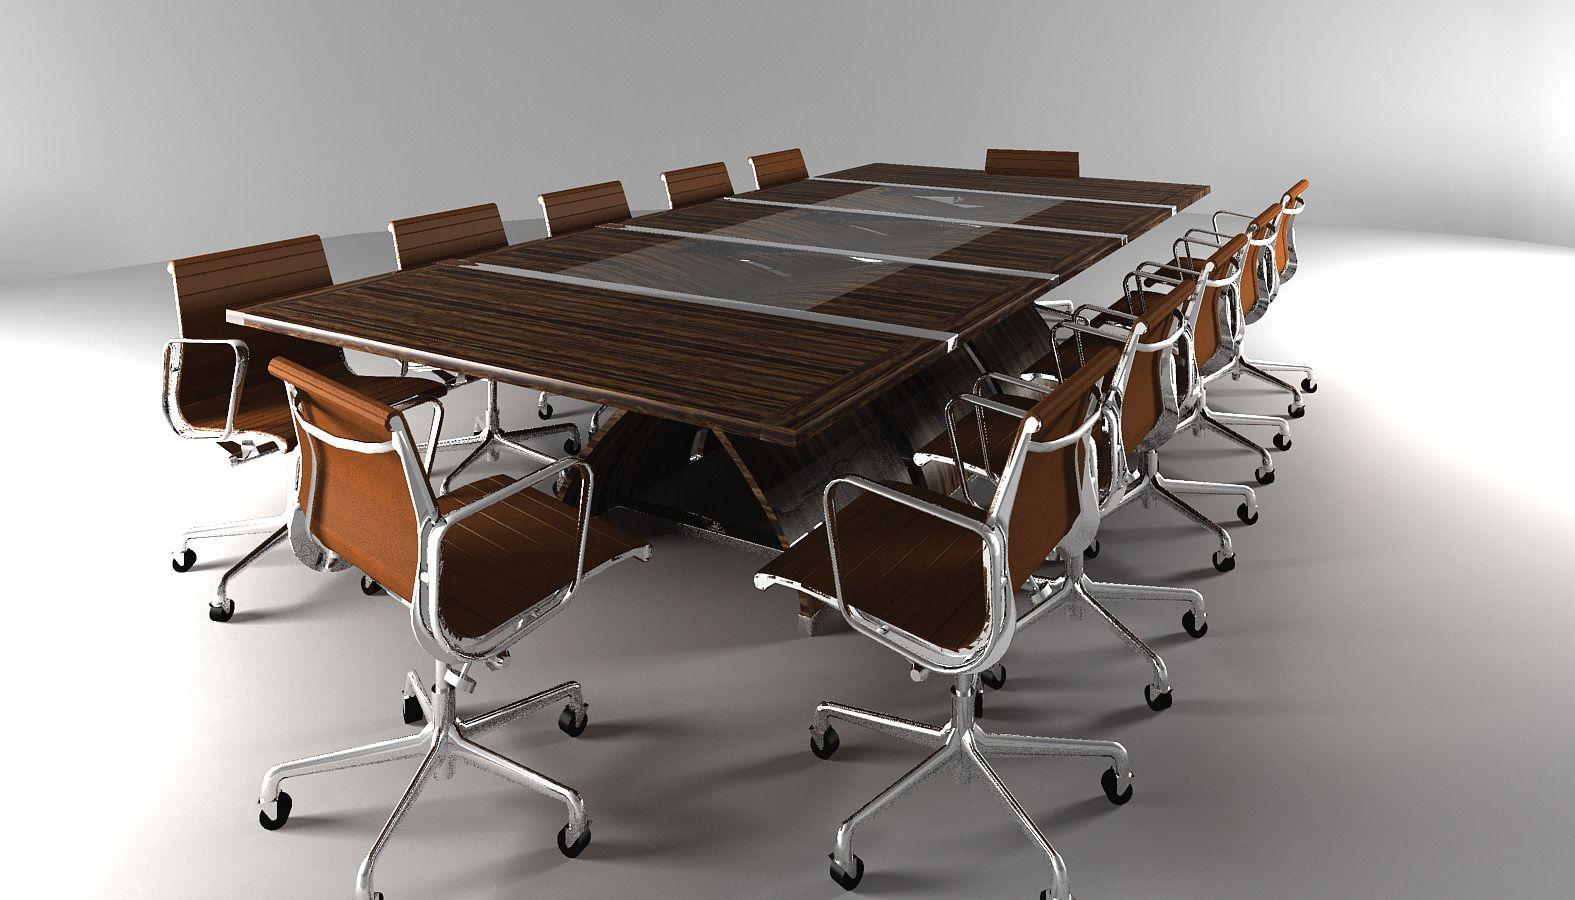 Nexus ConfrenceDining Table Modular Pack Flat Conference Table - Expanding conference table